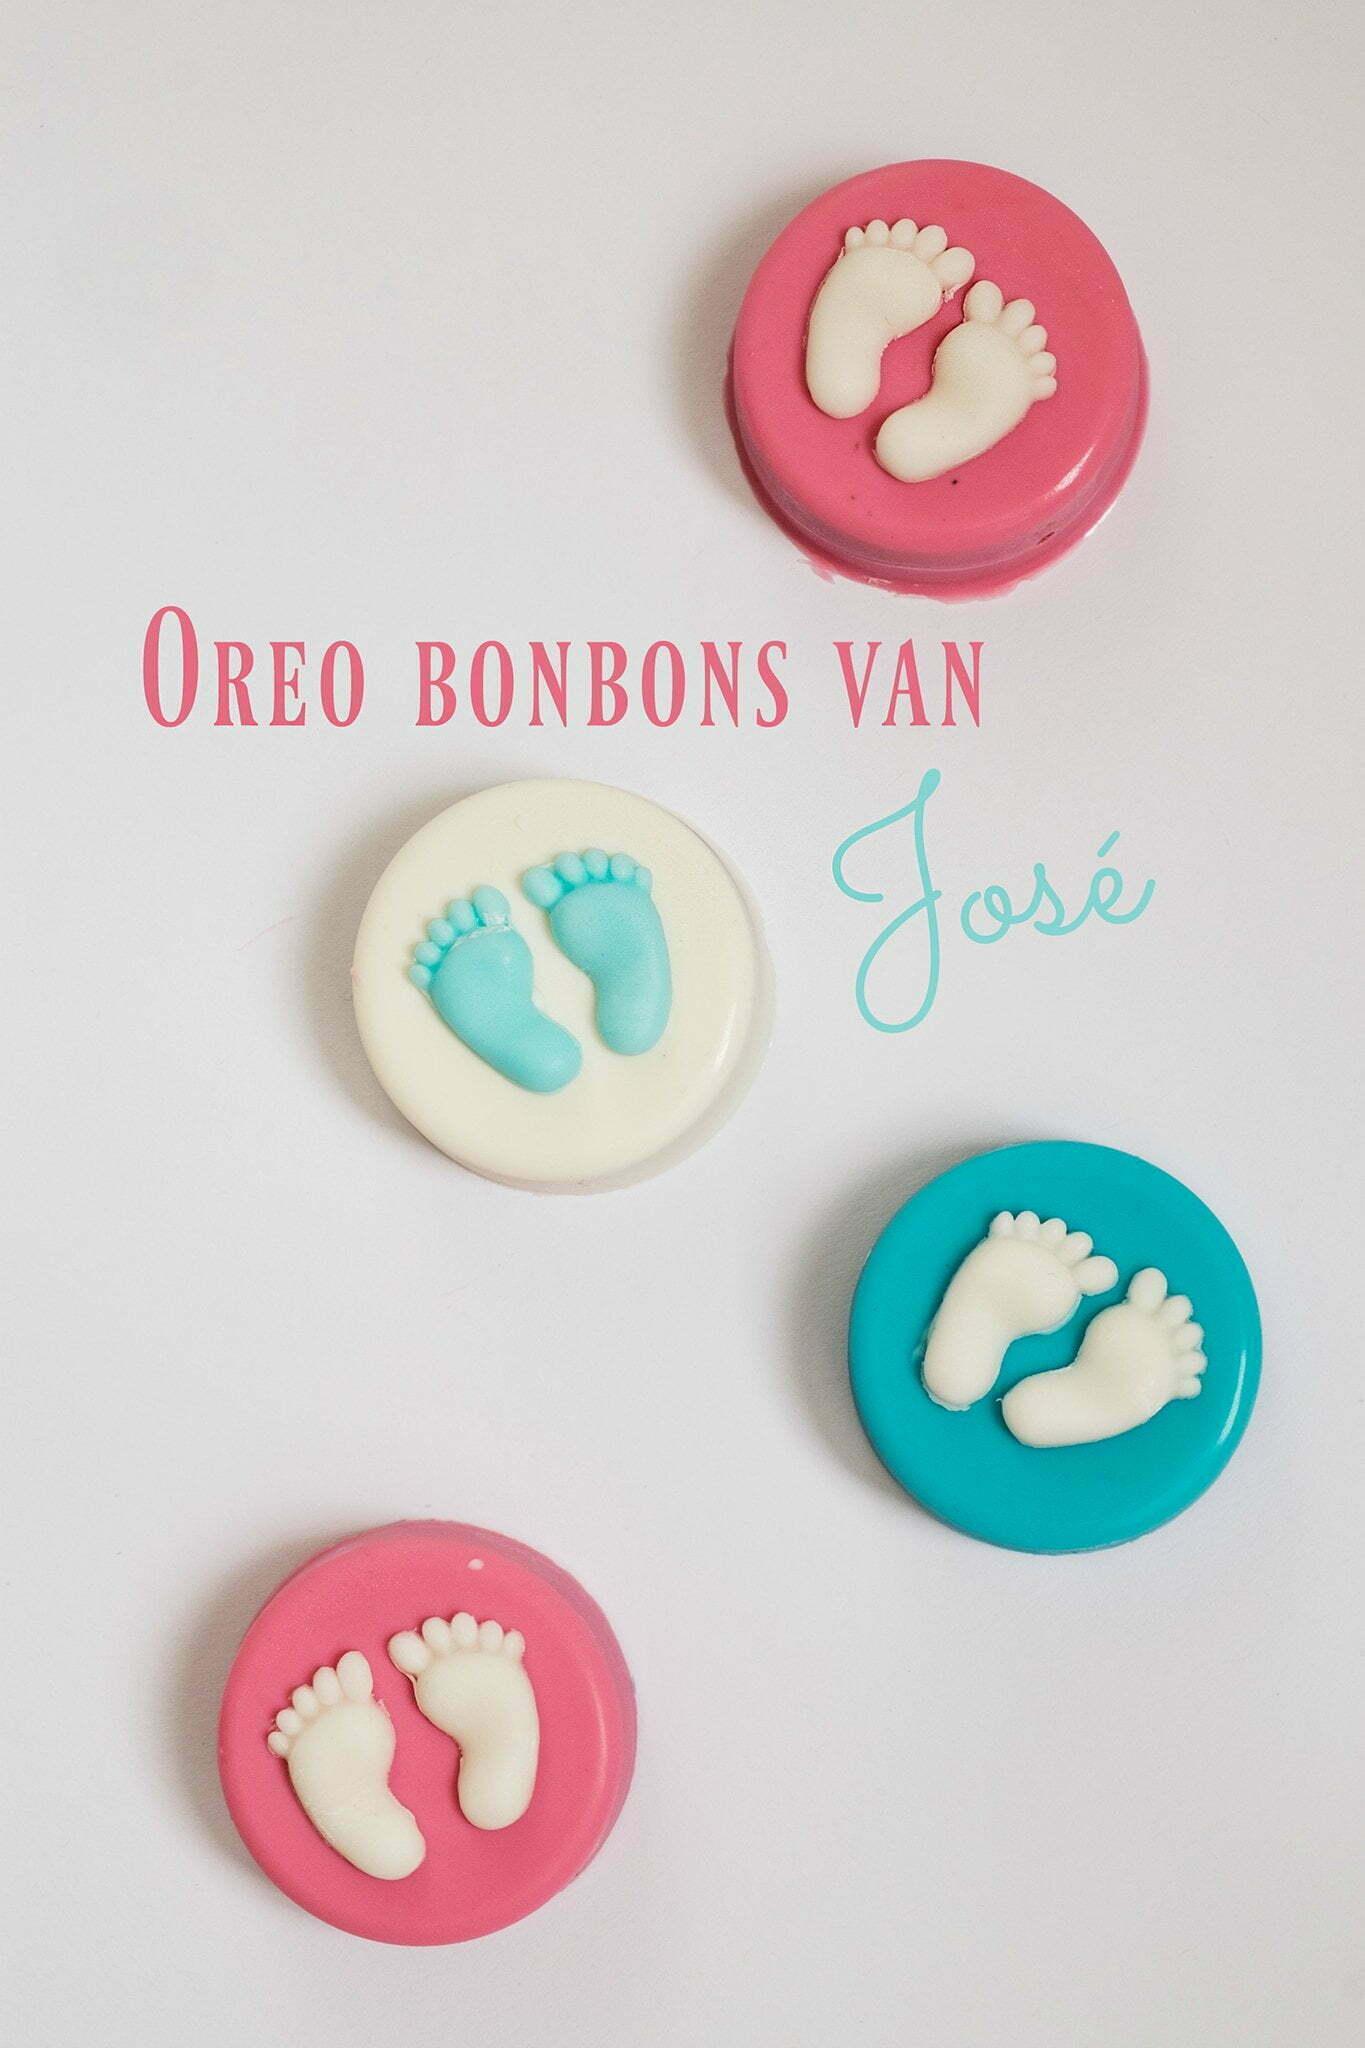 Hedendaags Oreo bonbons van José - Baby Gender Party - Gastblog 4 – ElsaRblog EU-54